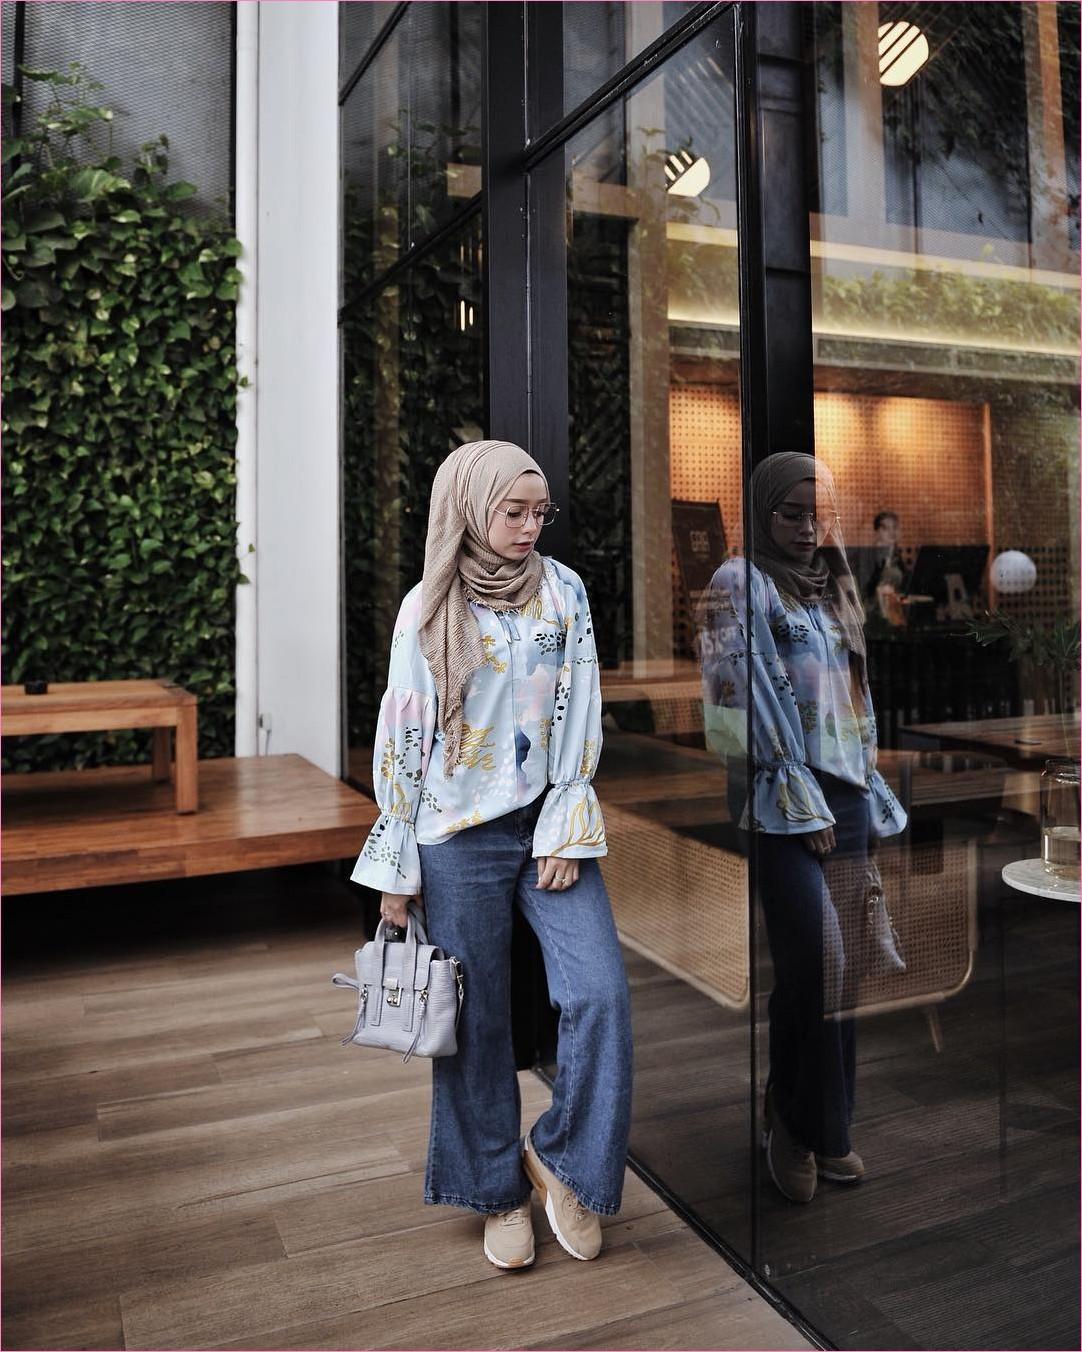 Outfit Kerudung Pashmina Ala Selebgram 2018 hijab pashmina rawis krem baju blouse lengan terompet biru muda celana jeans kulots denim kets sneakers handbags ungu pastel kacamata bulat ciput rajut ootd trendy kekinian hijabers cafe